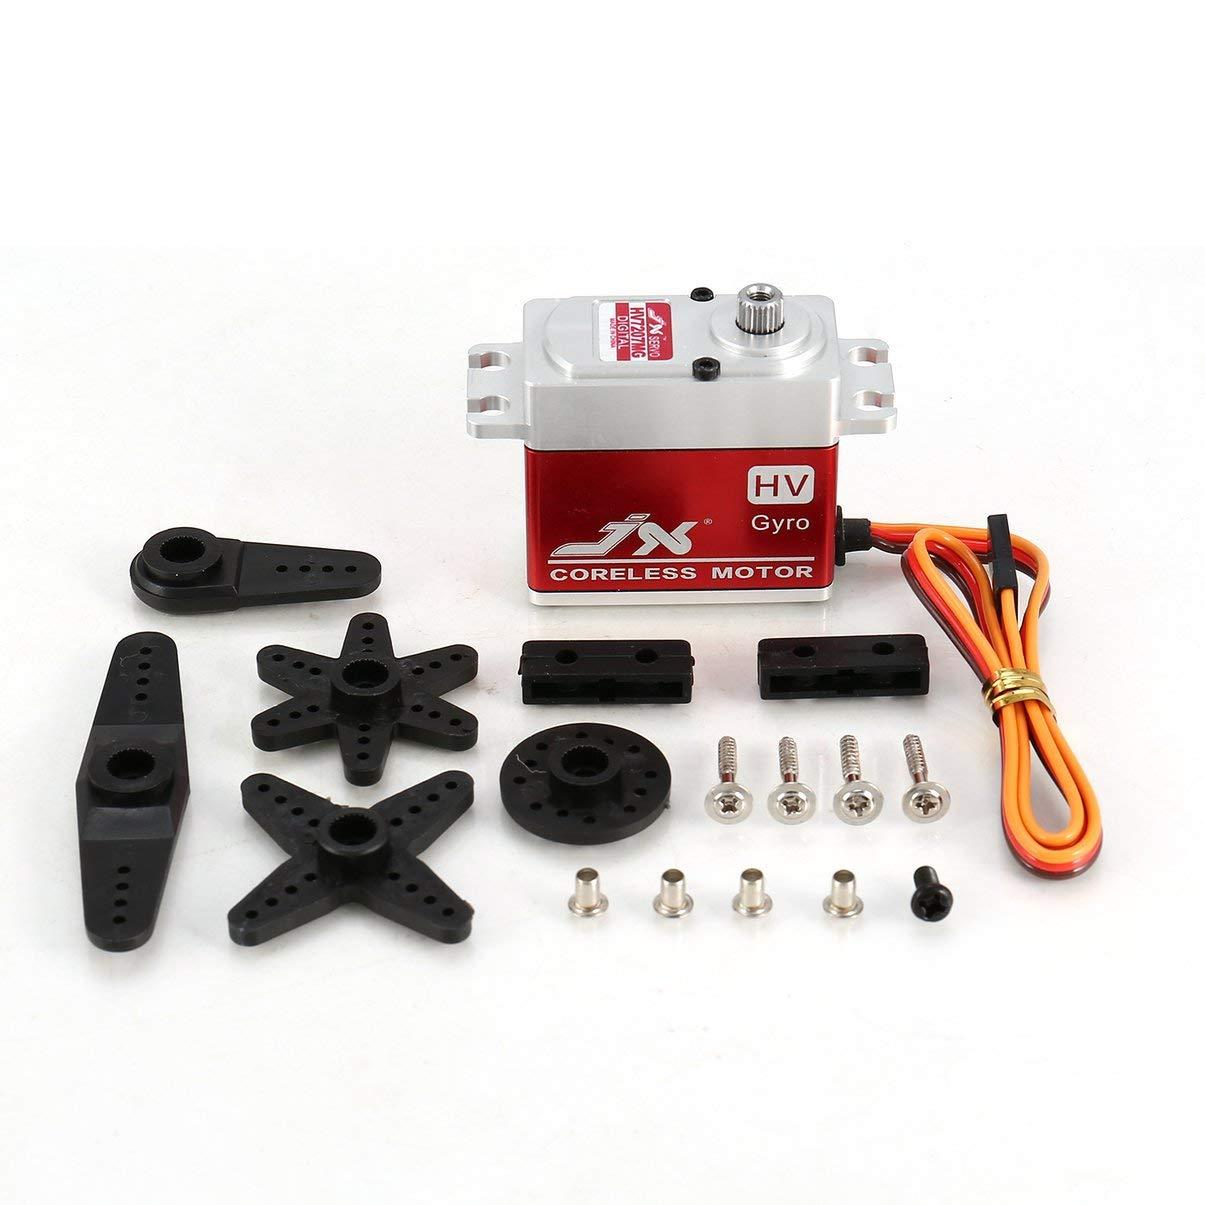 JullyeleDEgant JX PDI PDI PDI HV7207MG 7KG CNC Metalllenkung Digital Metal Gear Coreless Servo mit HV High Torque Spannung für RC Car Robot Drone eab72e